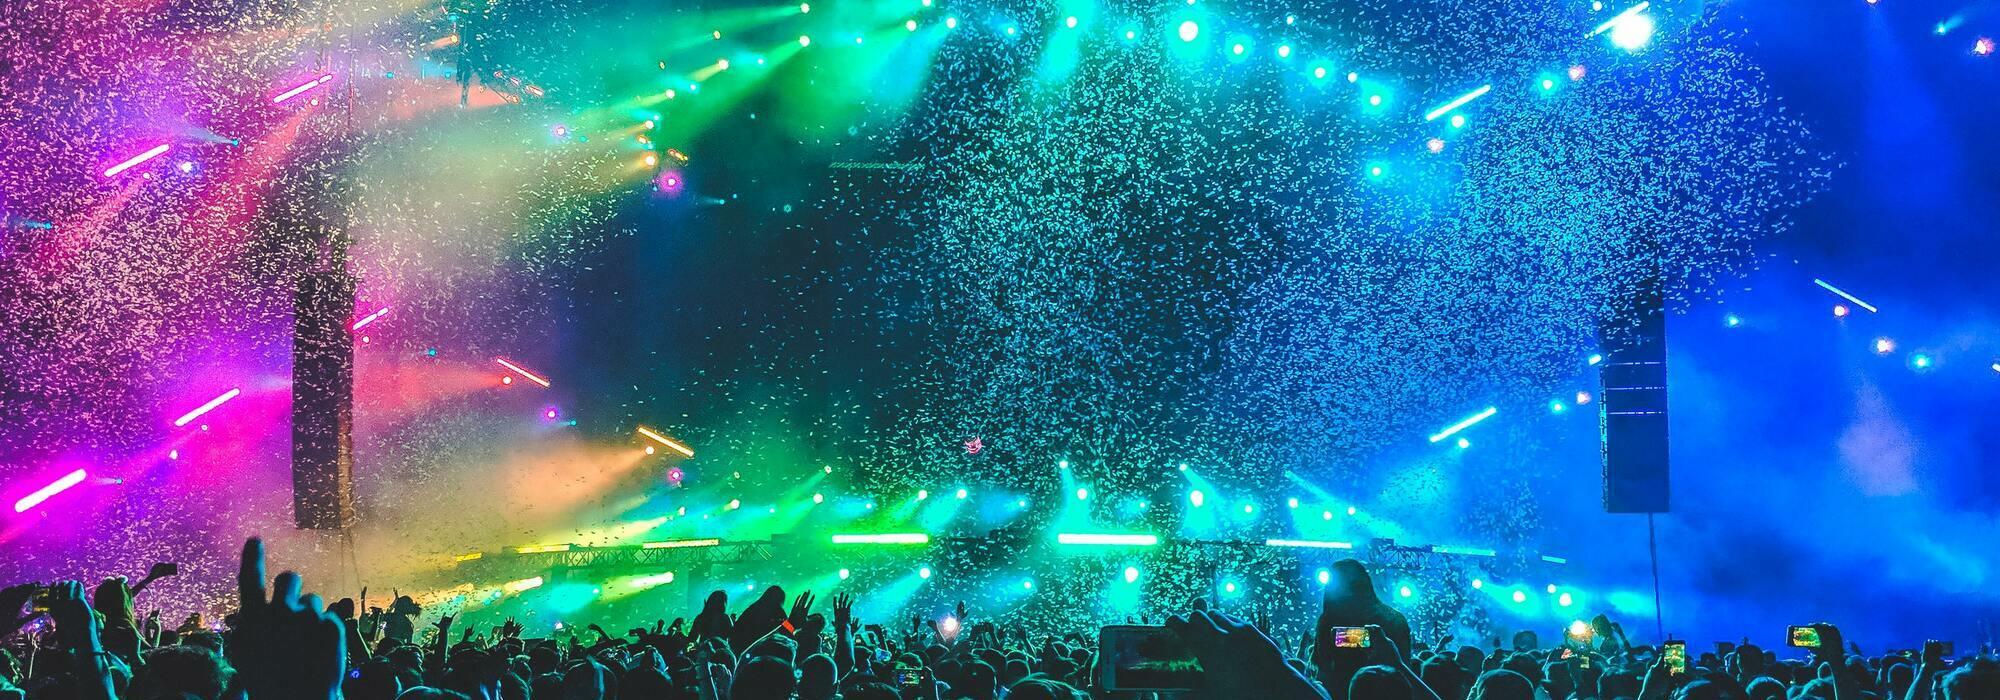 A ARC Music Festival live event